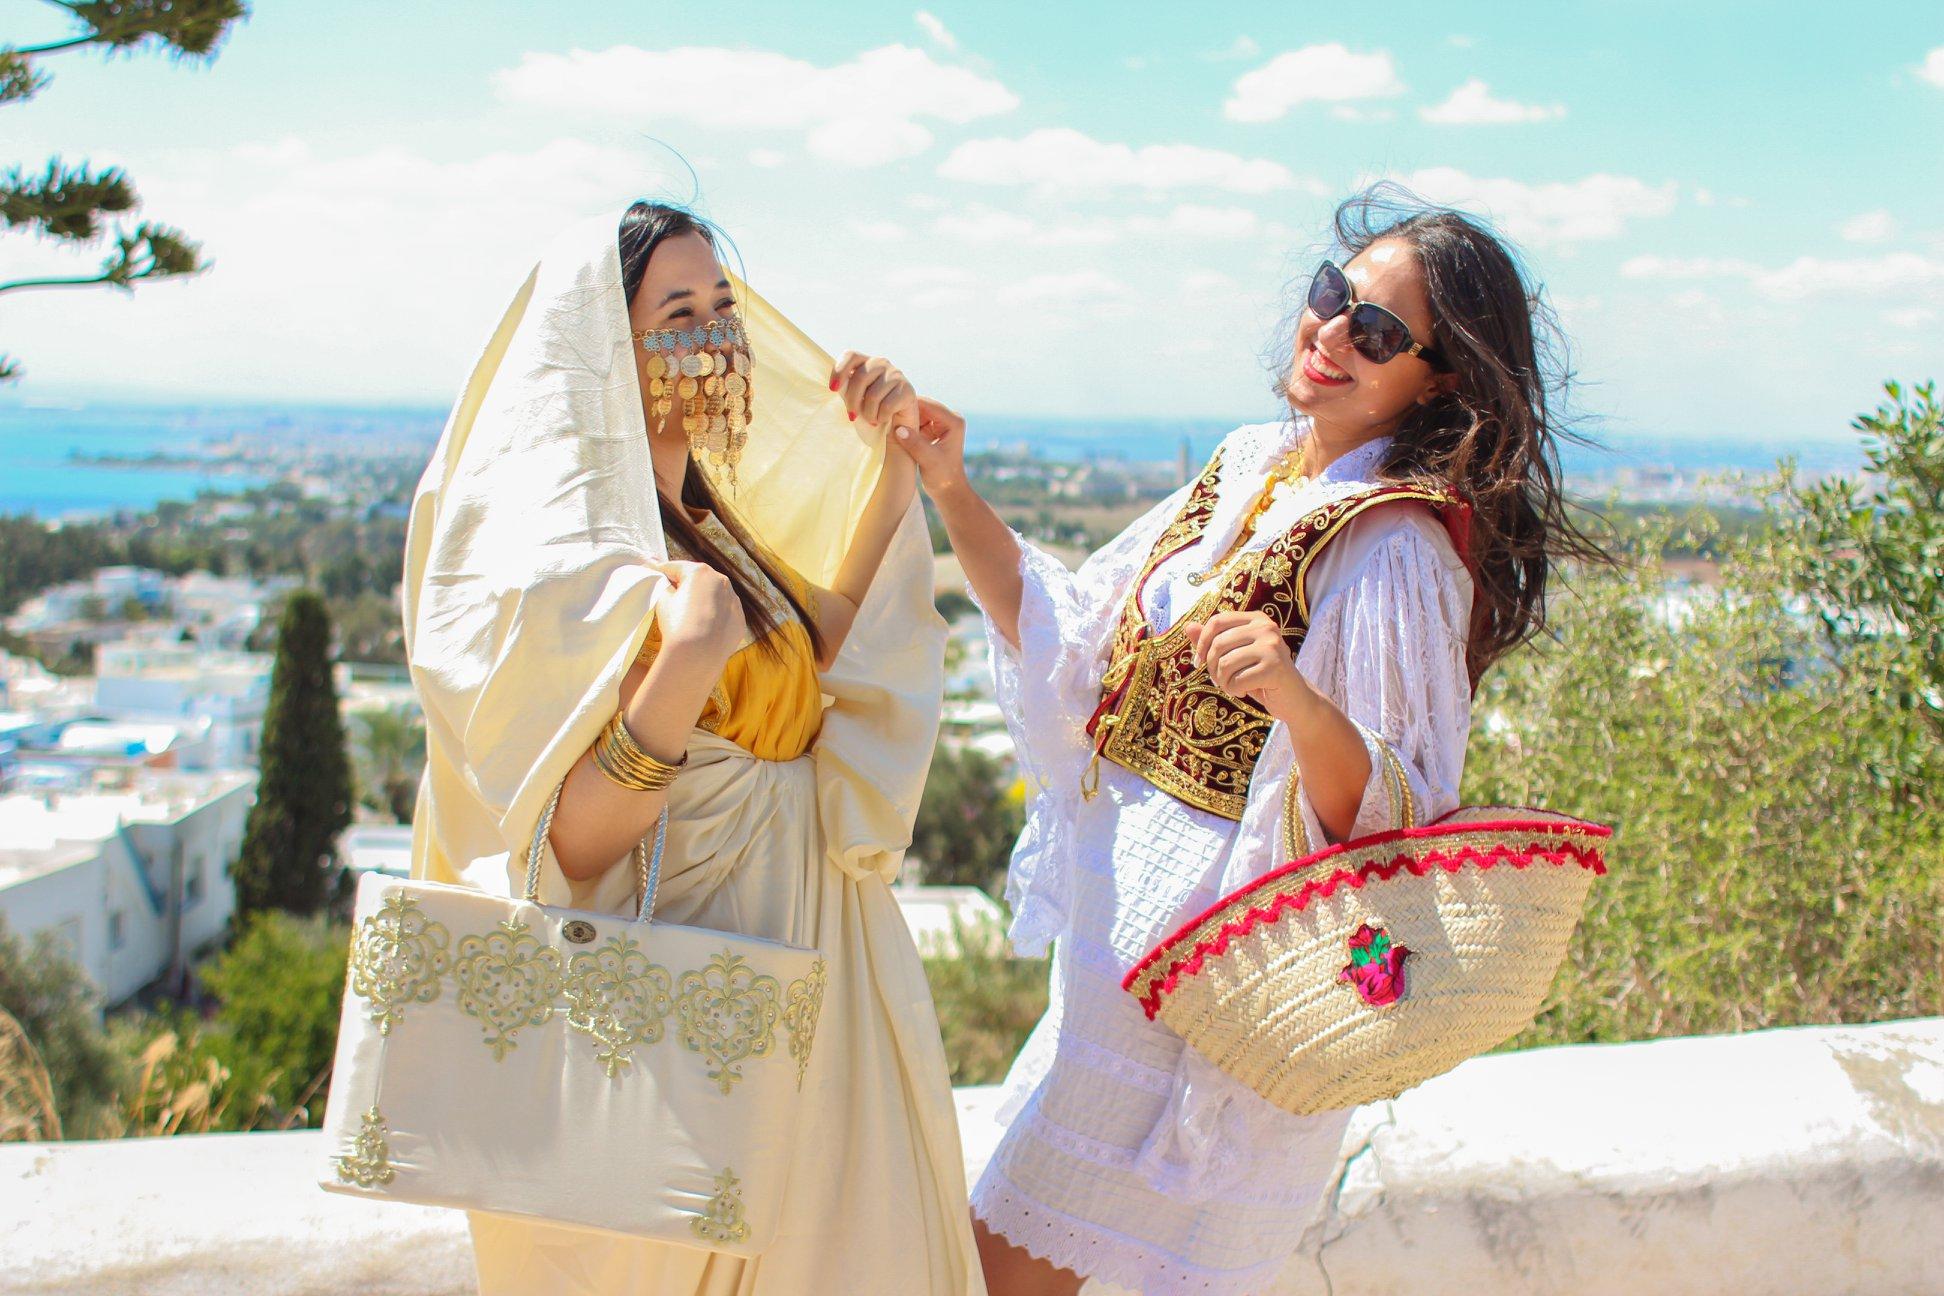 rahma1_plus_belles_mariées_tunisiennes_190_2019